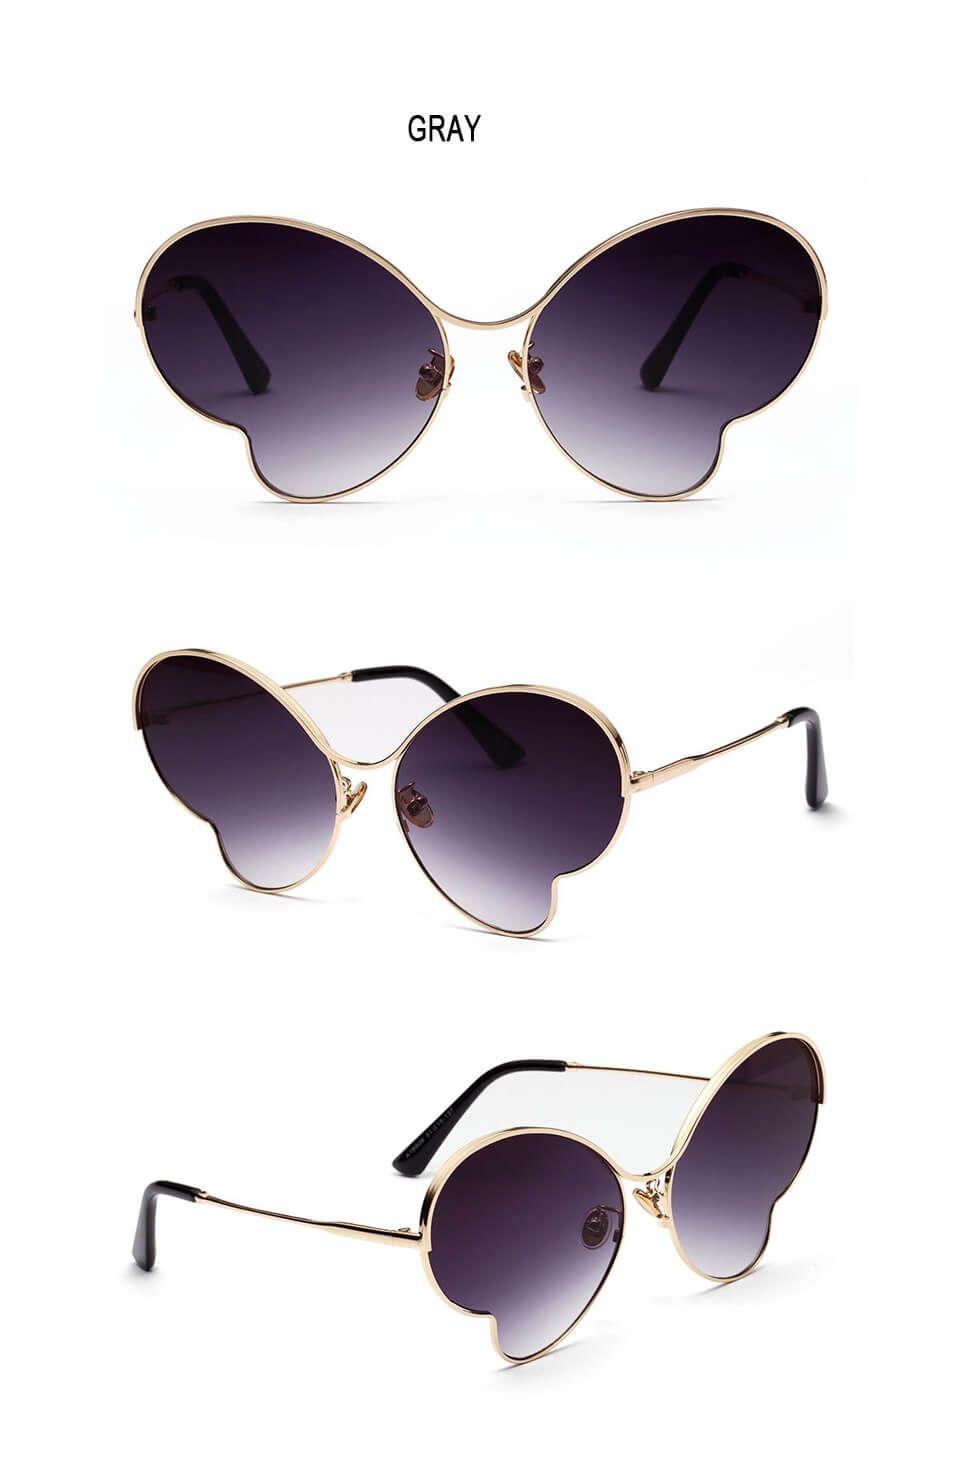 7992c1bdbaa2 ELITERA Butterfly Shaped Sunglasses For Women Online | Sunglasses ...